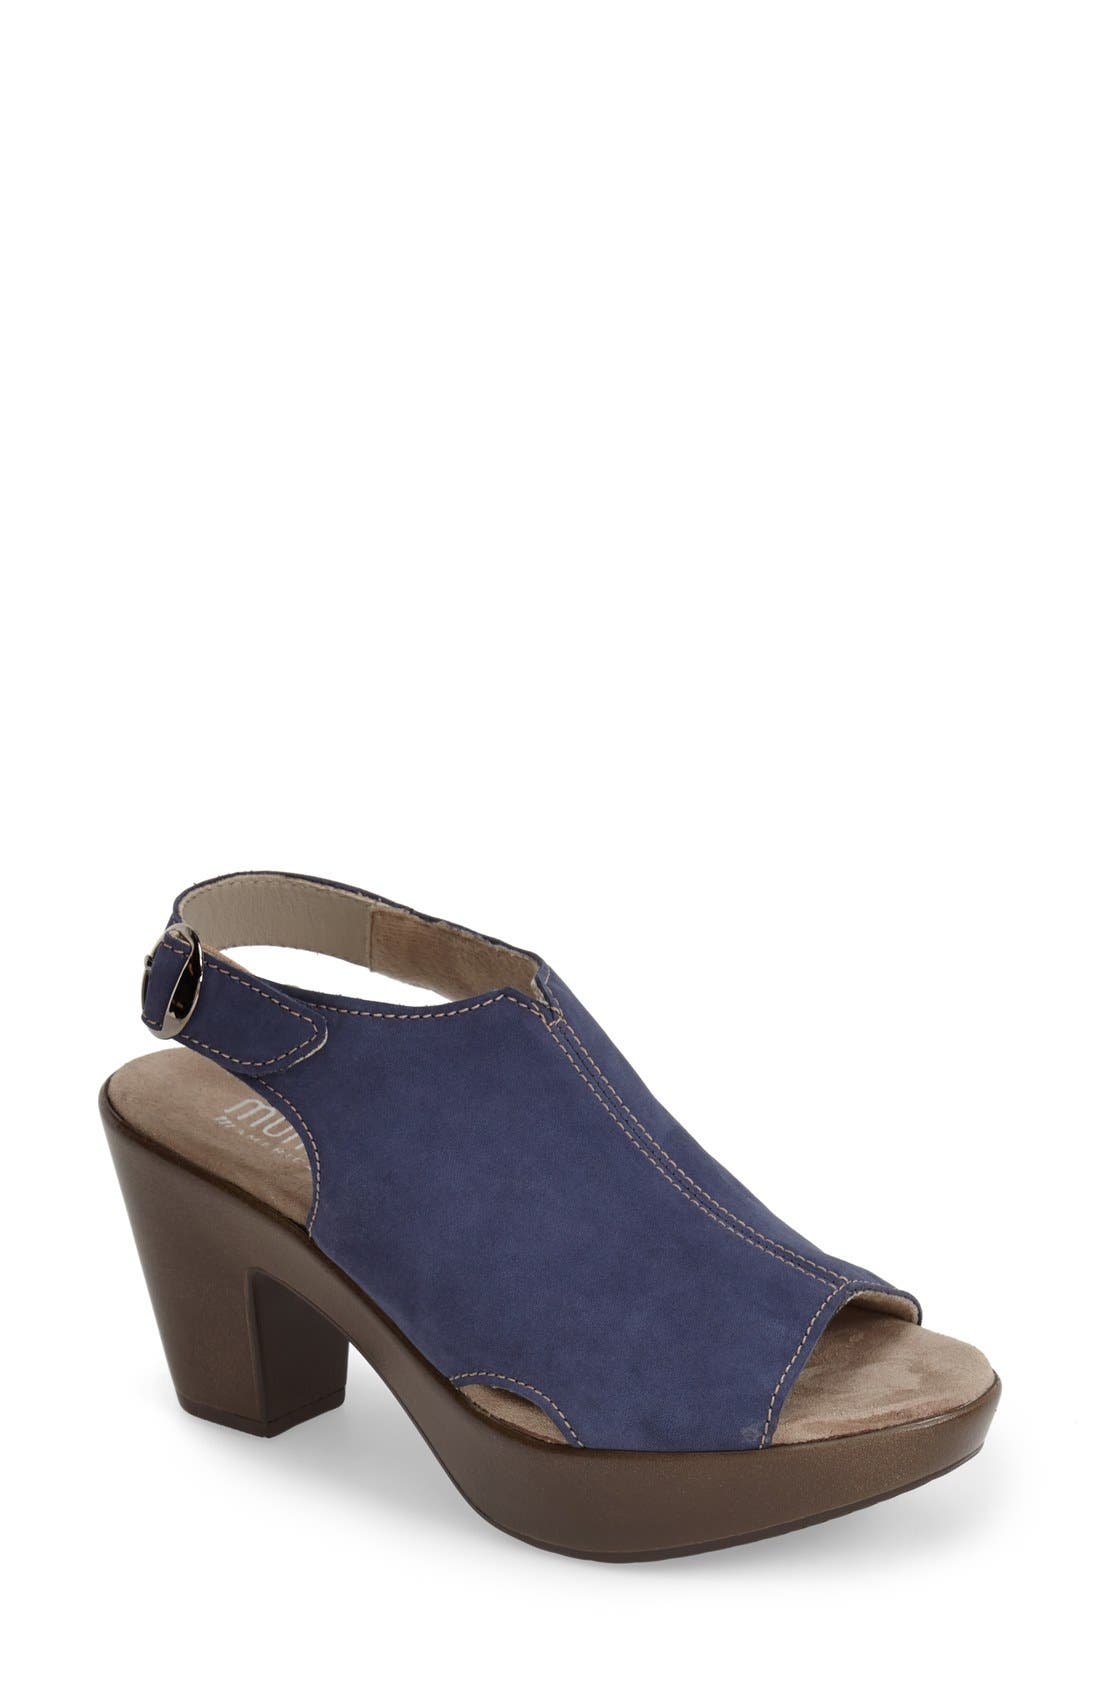 MUNRO 'Kirsten' Slingback Sandal